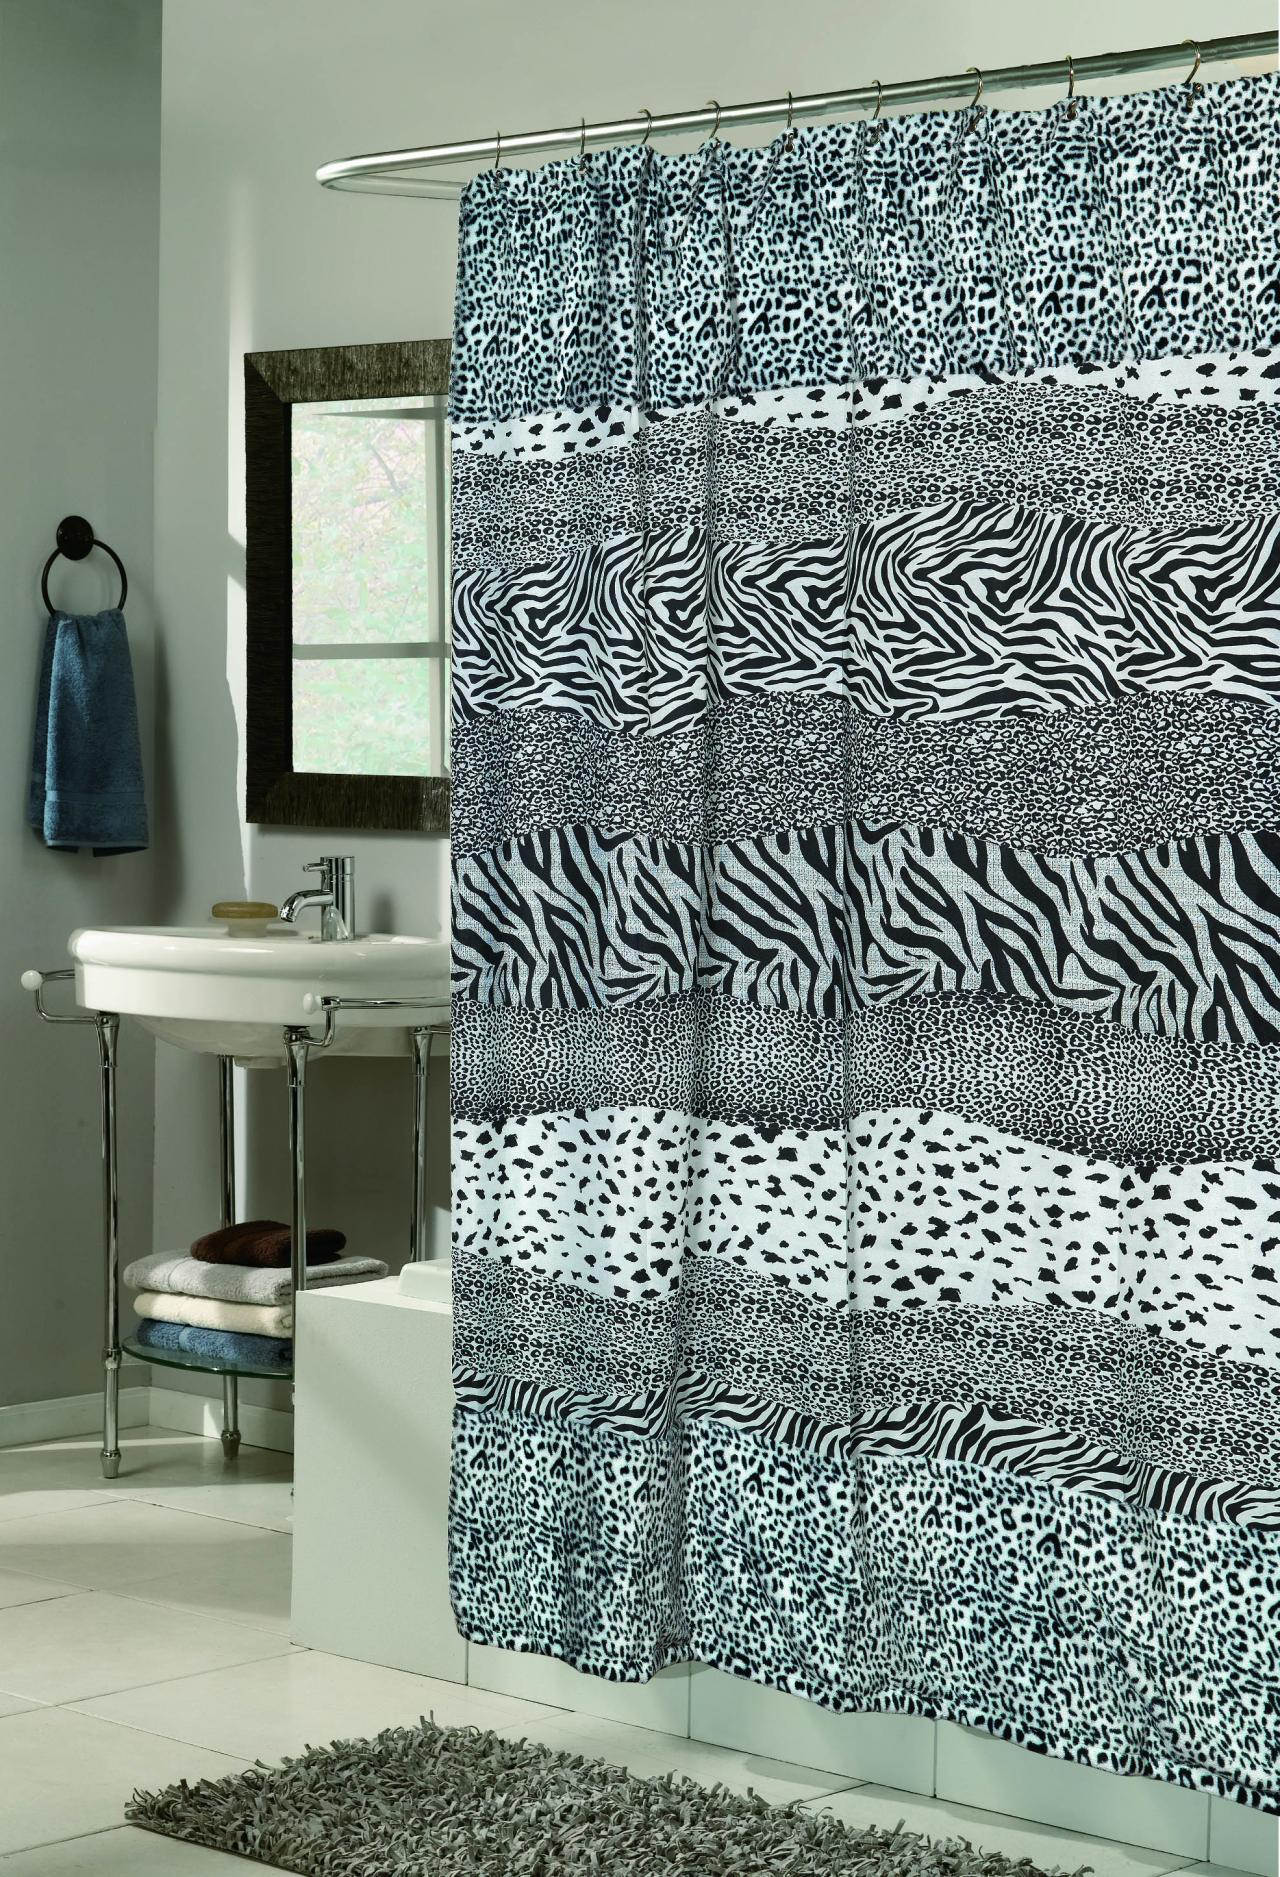 Leopard shower curtain -  Shower Curtain Animal Instincts Collection Snow Leopard